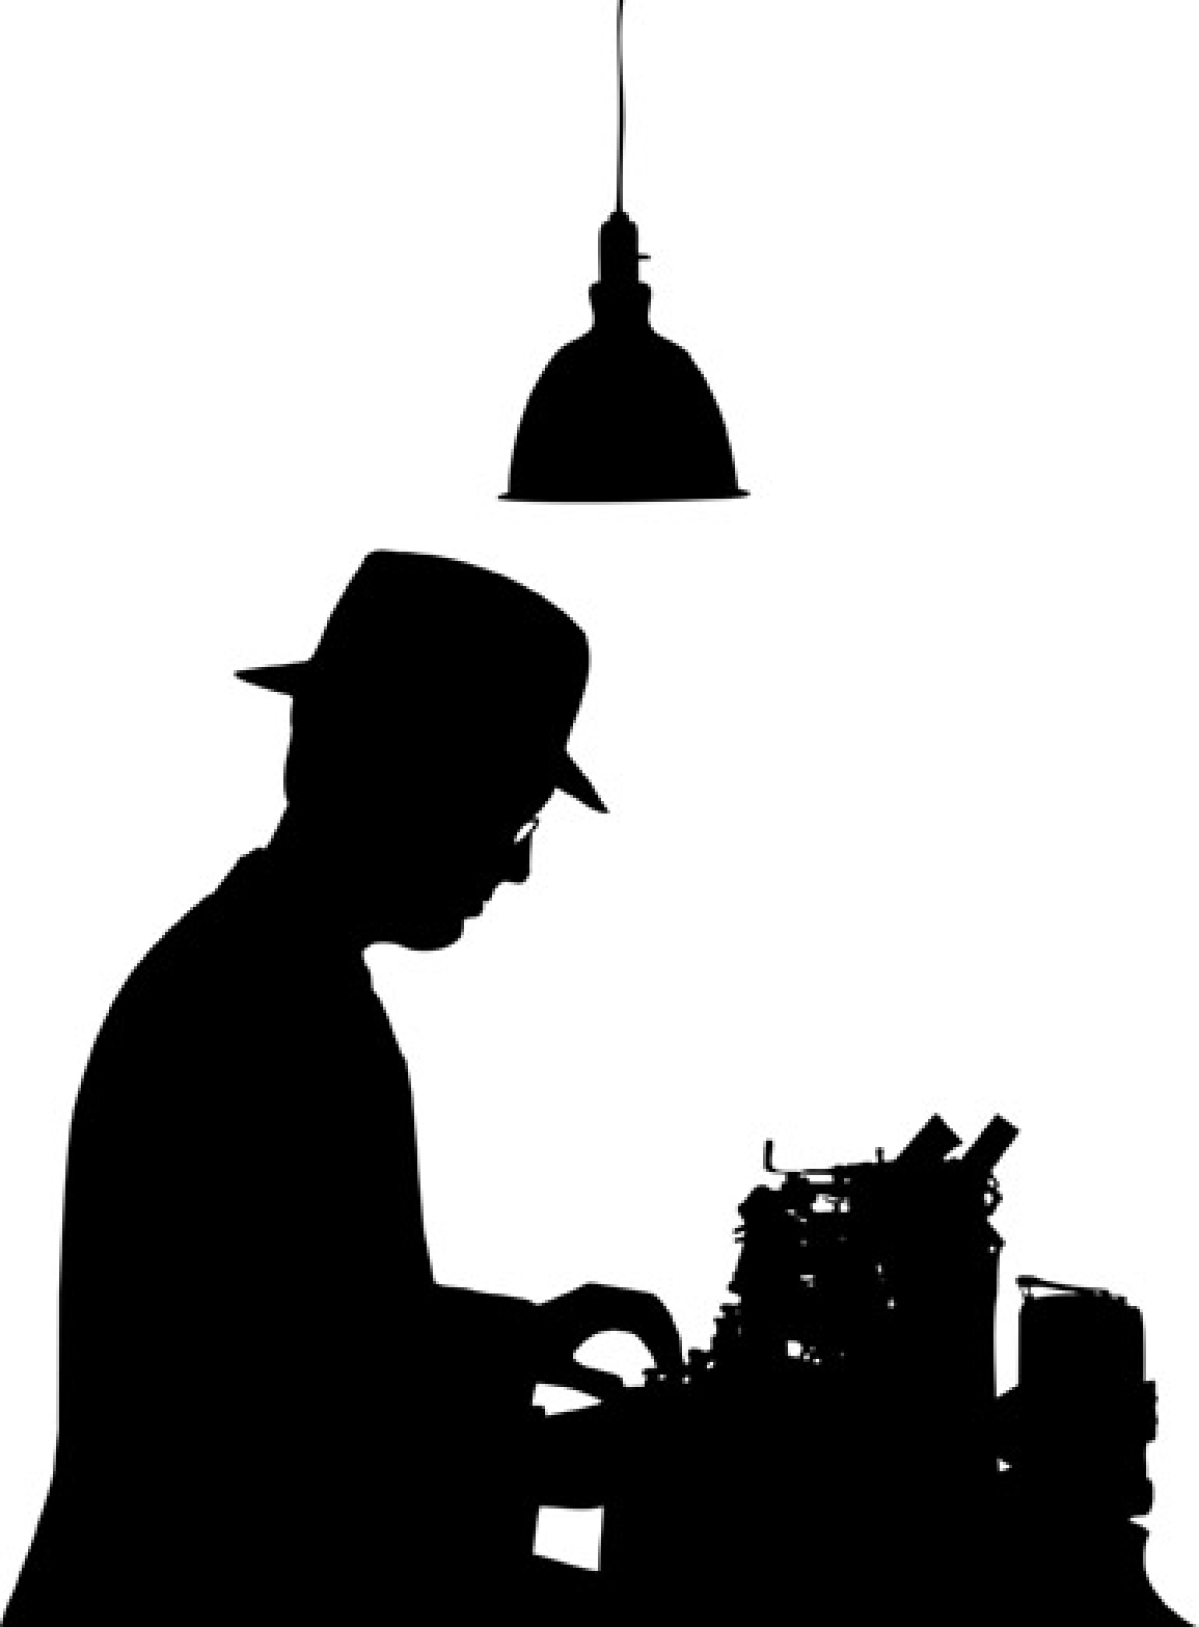 Going Beyond Investigative Journalism